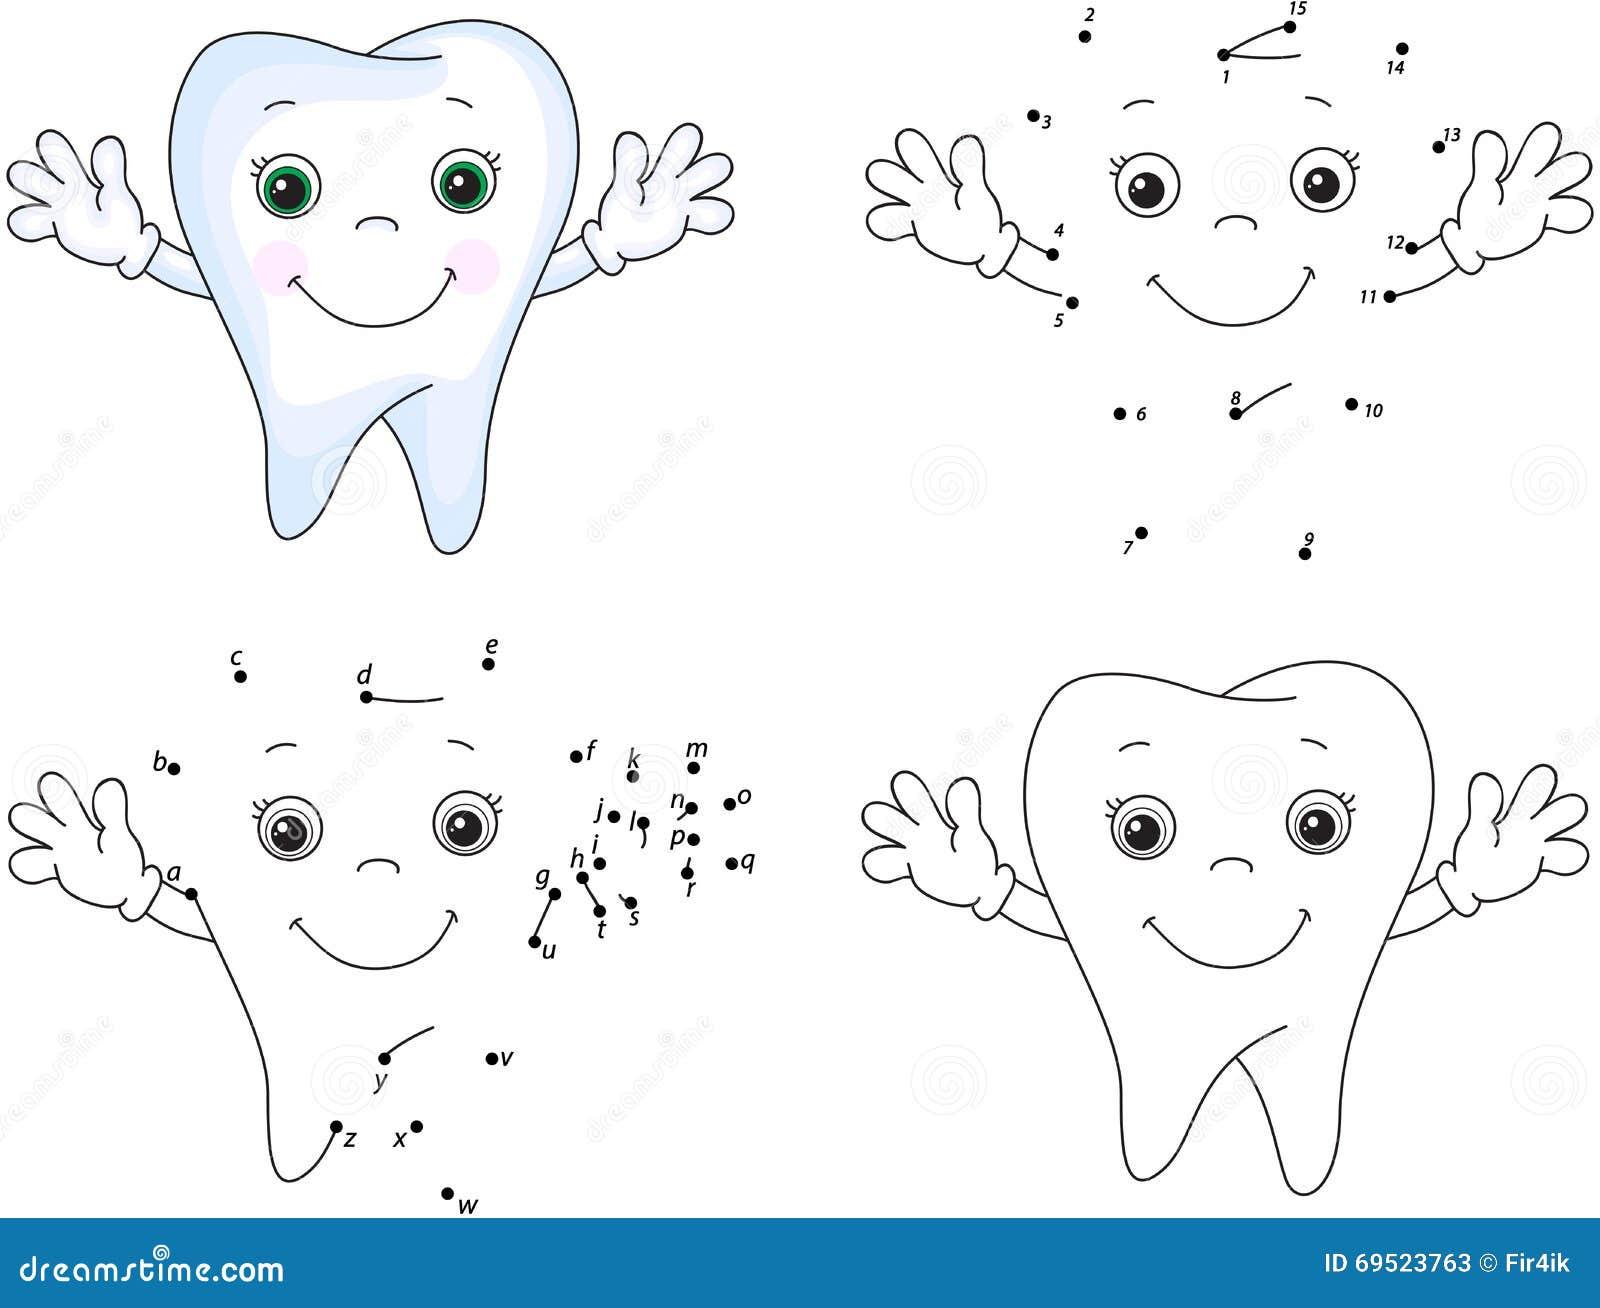 Dibujo Dientes Para Colorear E Imprimir: Cartoon Tooth Smiles. Coloring Book And Dot To Dot Game